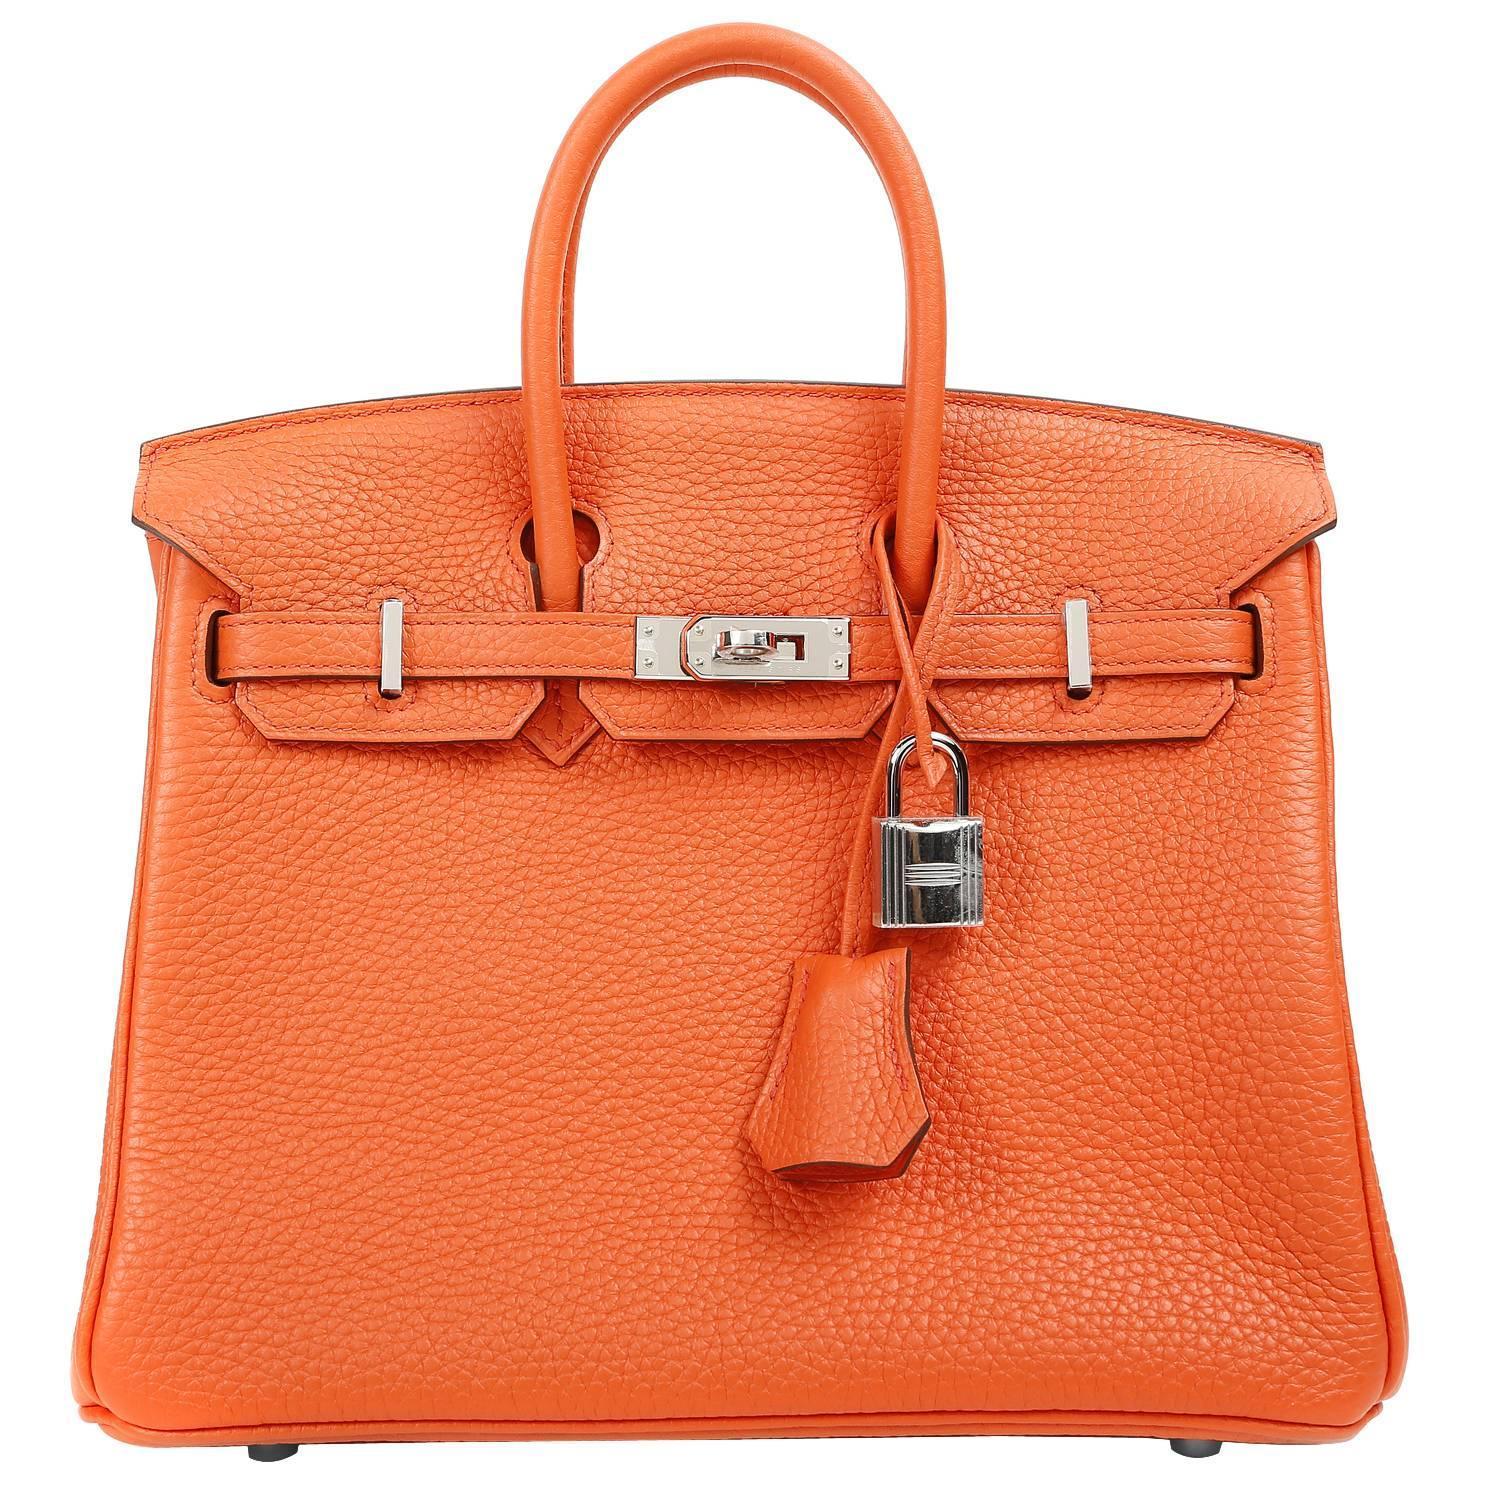 ff55dbb7fc Hermès Poppy Togo Birkin Bag- 25 cm with Palladium For Sale at 1stdibs